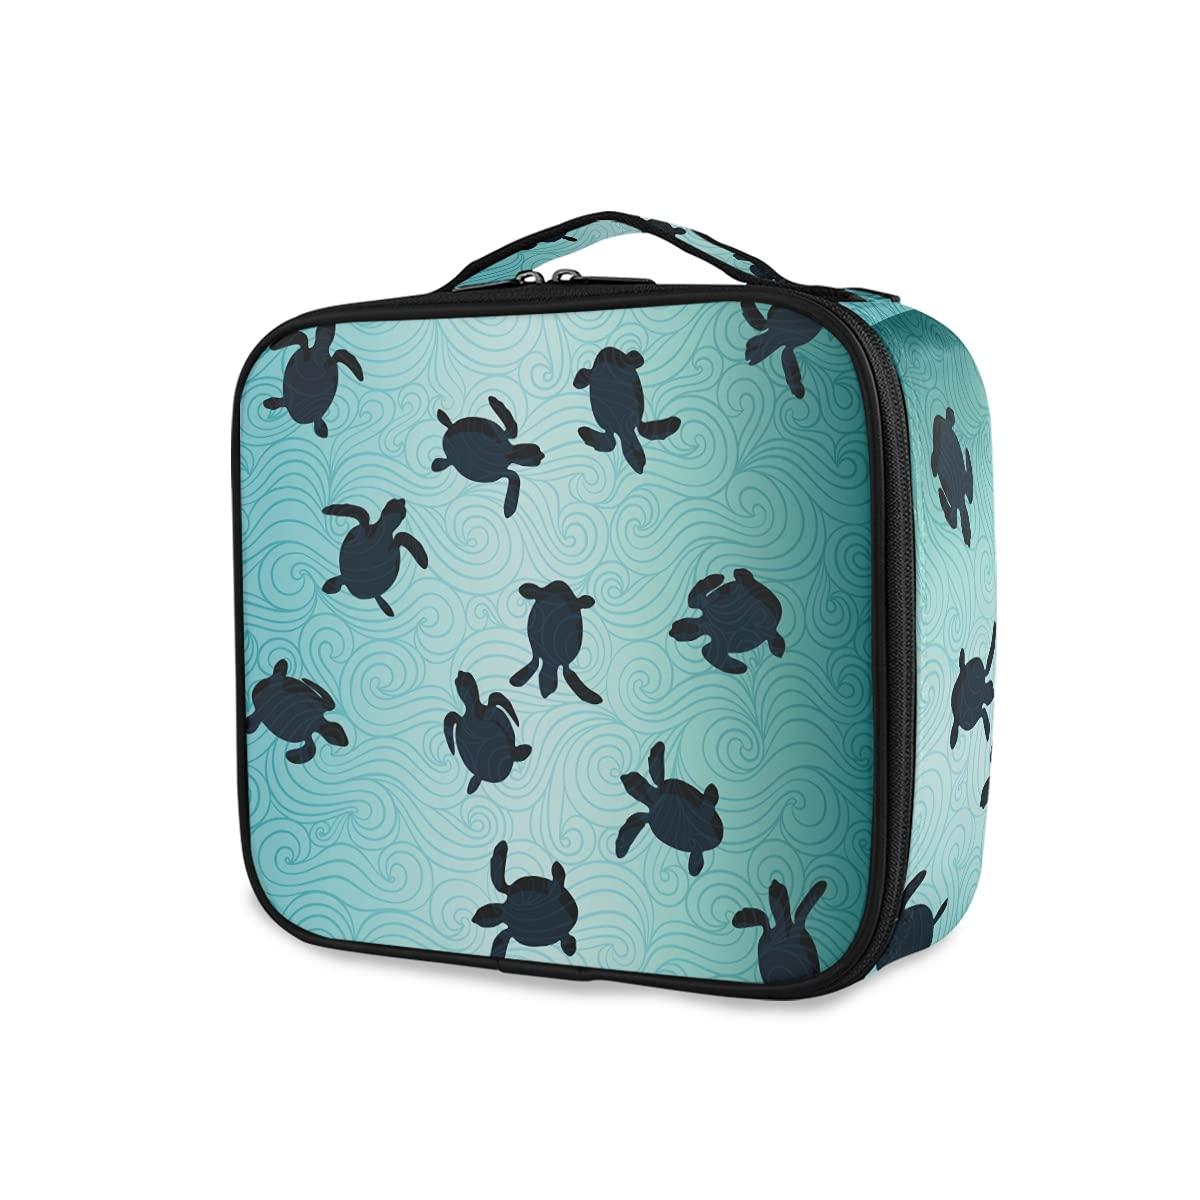 OTVEE Ocean Life Sea Turtle Wholesale Cosmetic Large Makeup Travel Bag